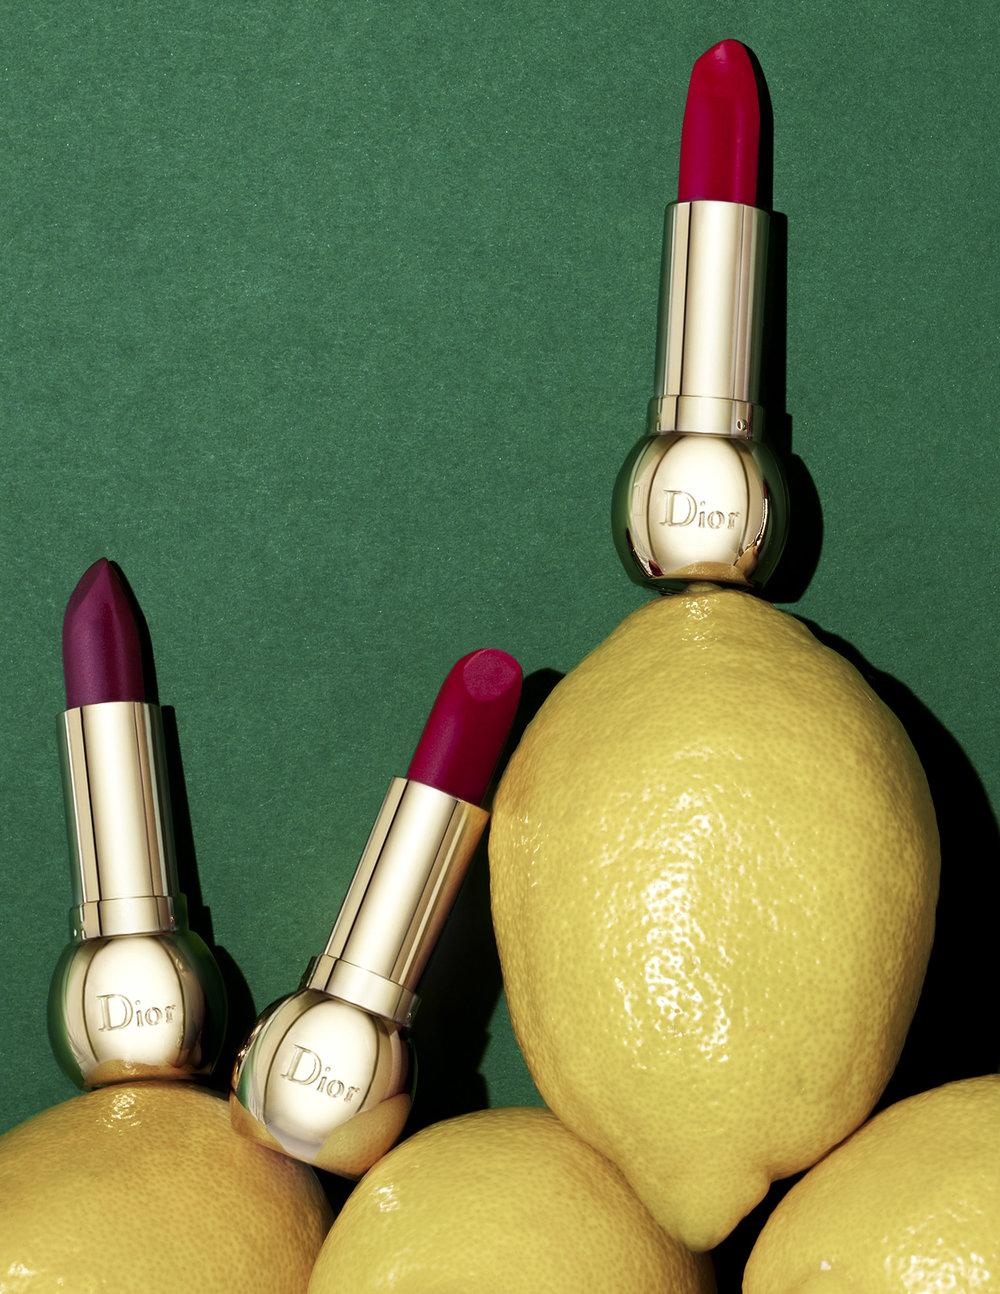 V1_Dior_AO6A4238-3 crop 2.jpg